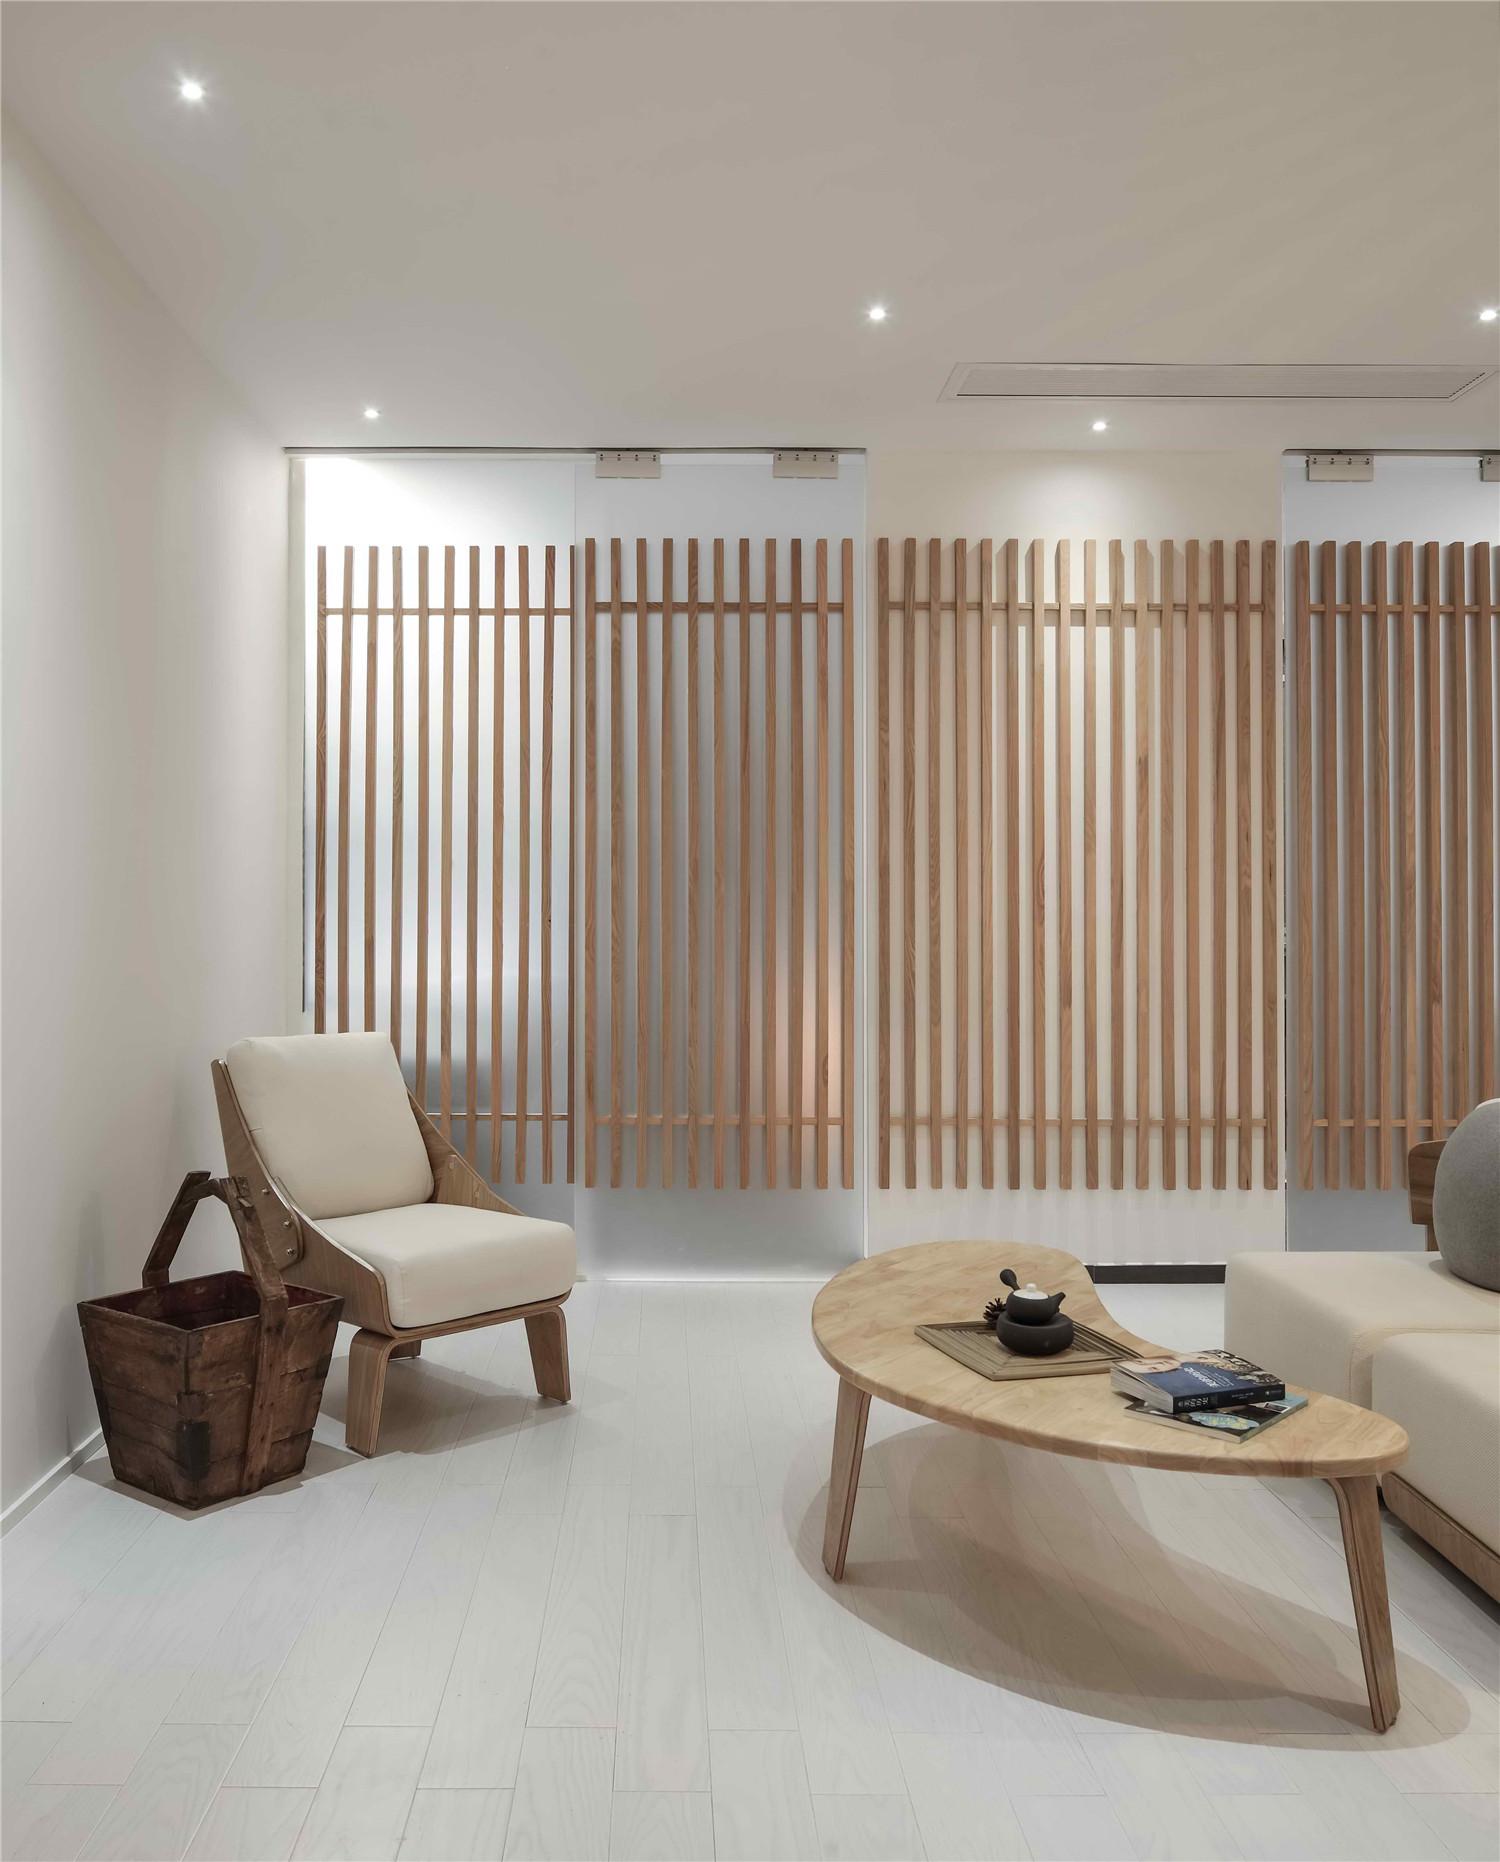 Ripple Hotel - Qiandao Lake design brief Hisheji (67)